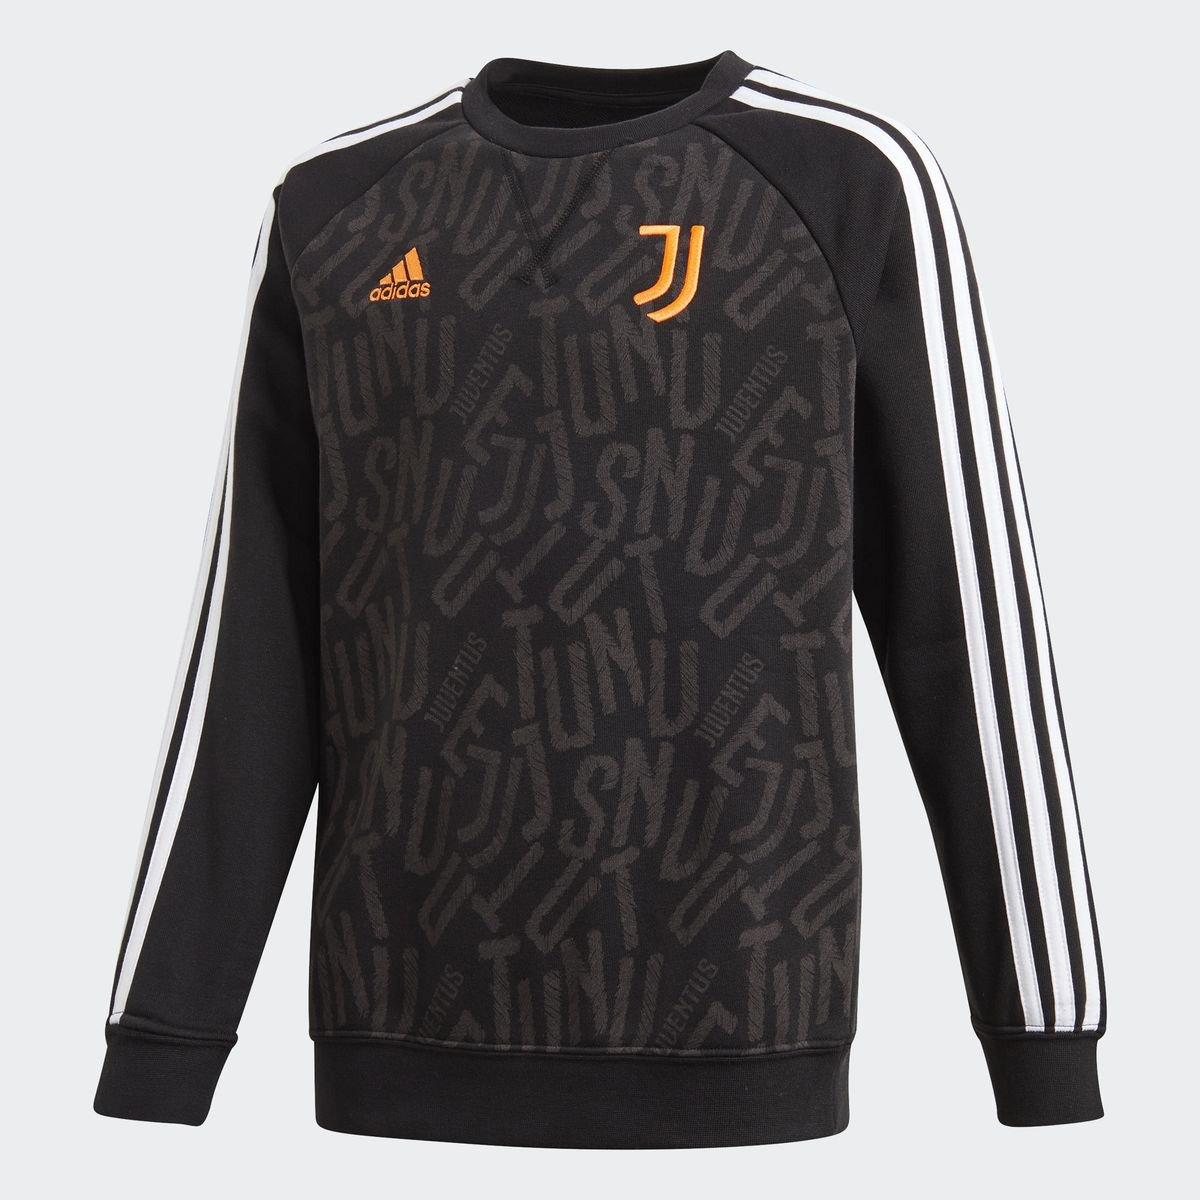 Moletom Juvenil Juventus Adidas Crew Sweat Adidas